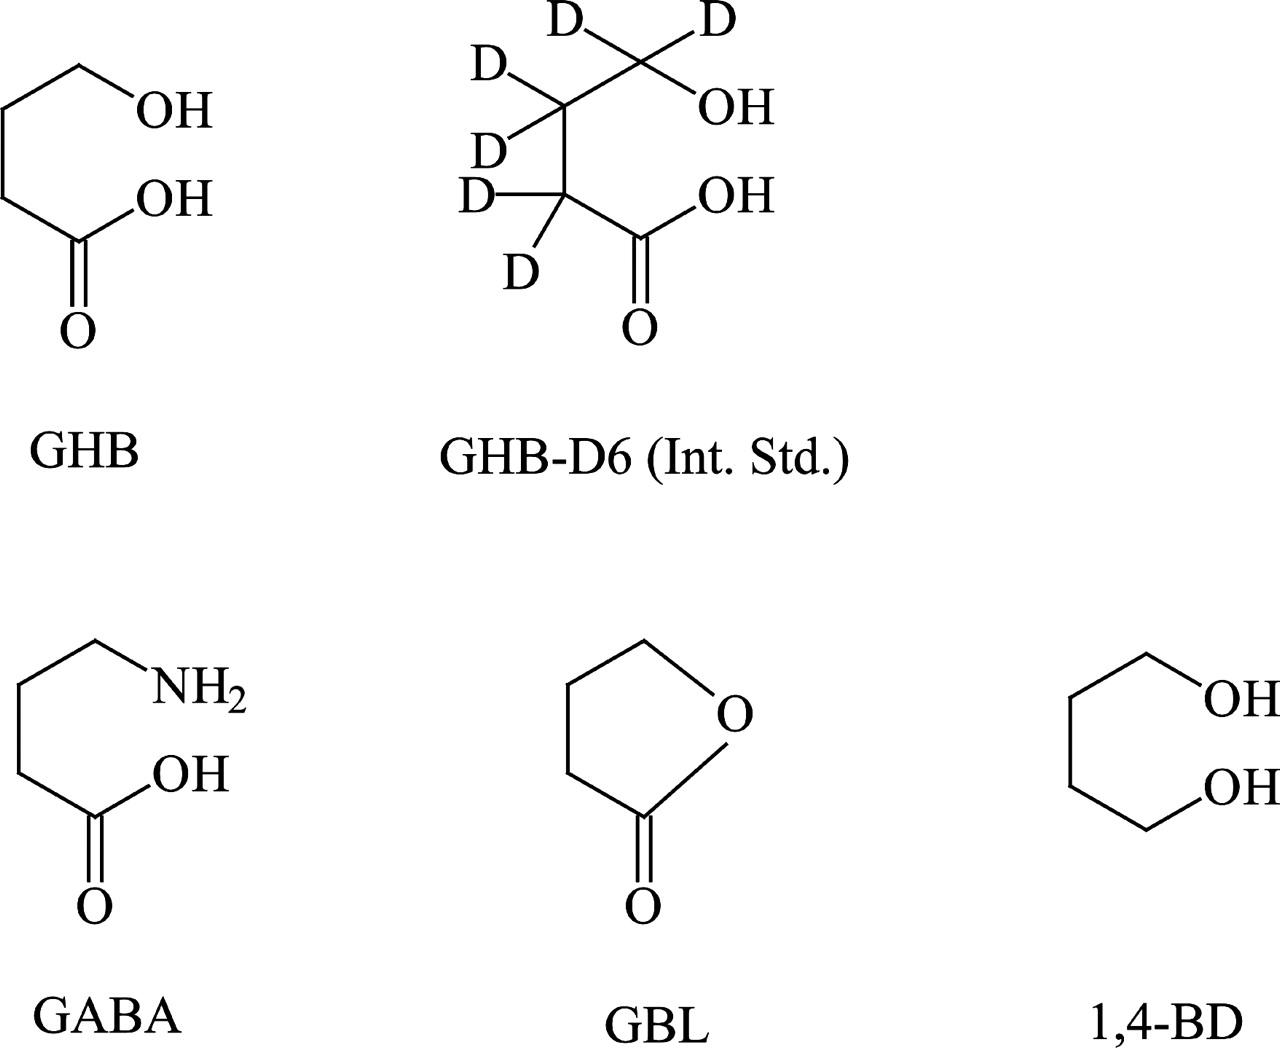 Renal Clearance of γ-Hydroxybutyric Acid in Rats: Increasing Renal ...